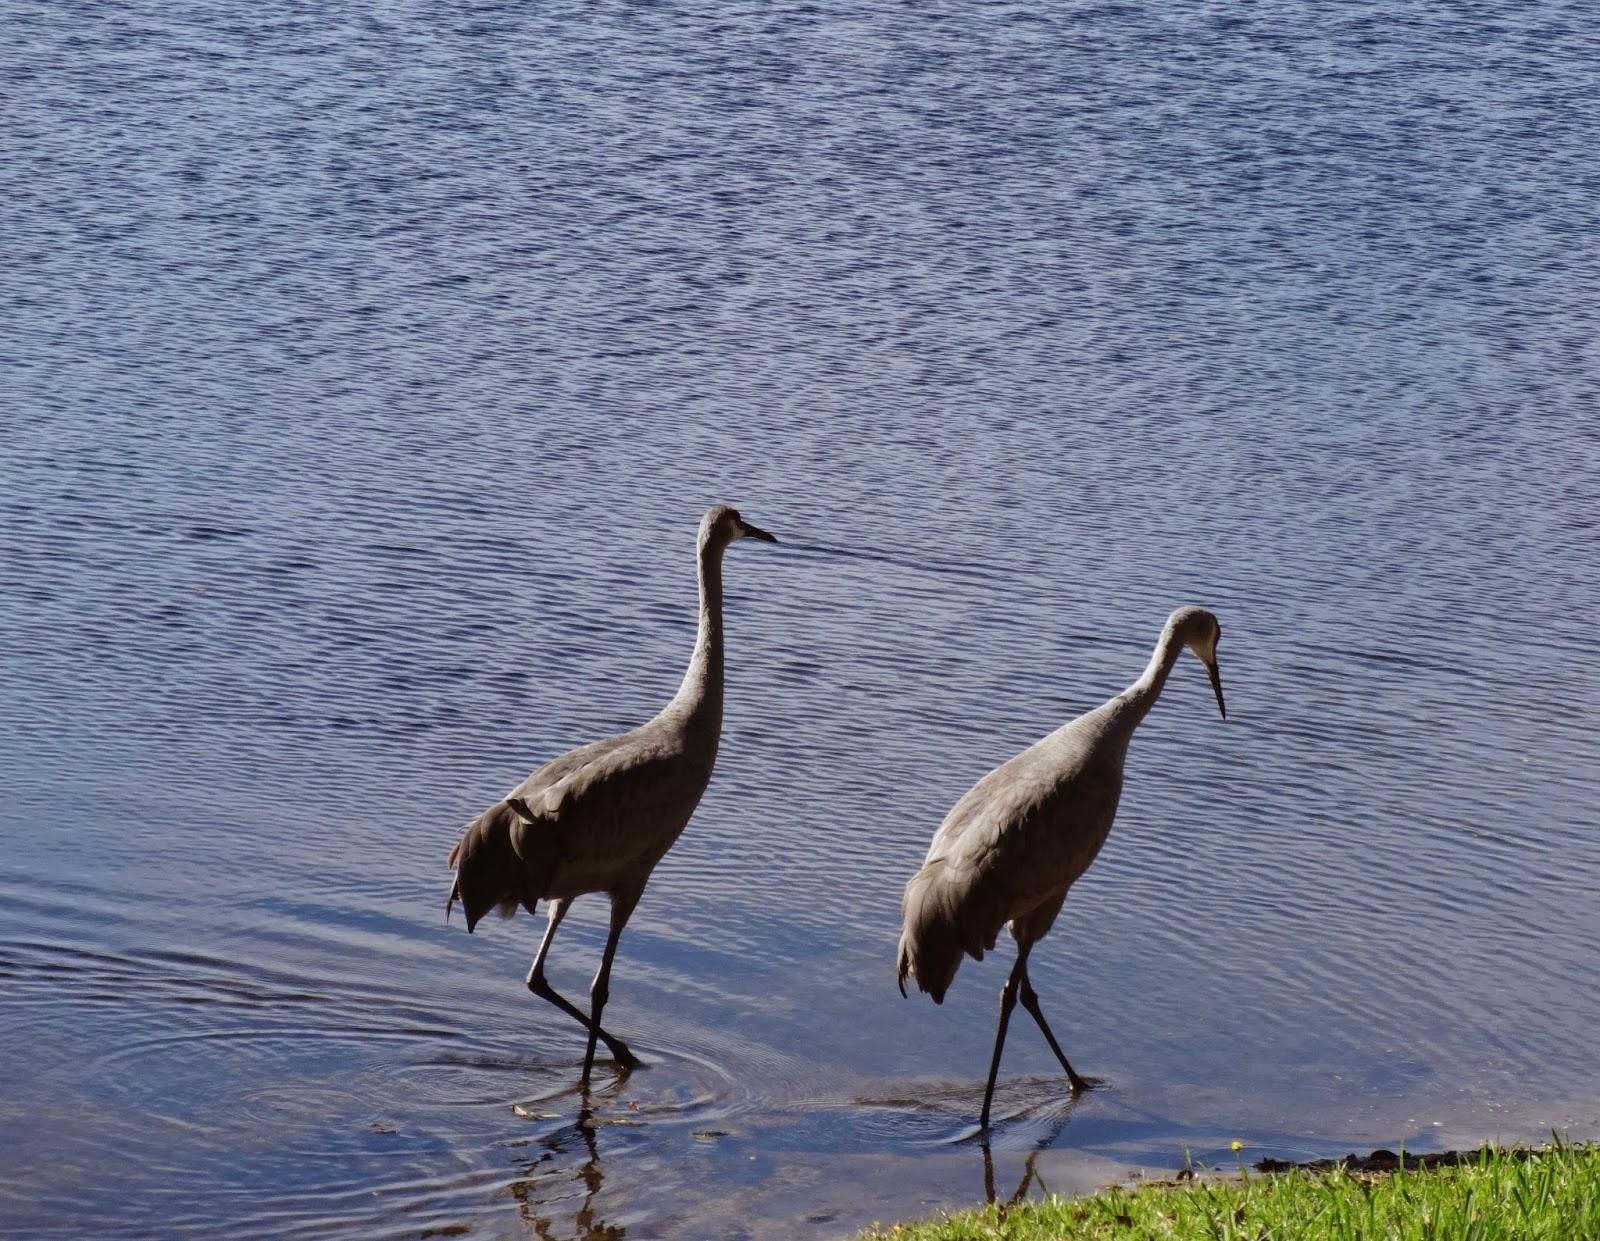 Florida backyard birds pictures Rentals in Florida - Snowbird Resources